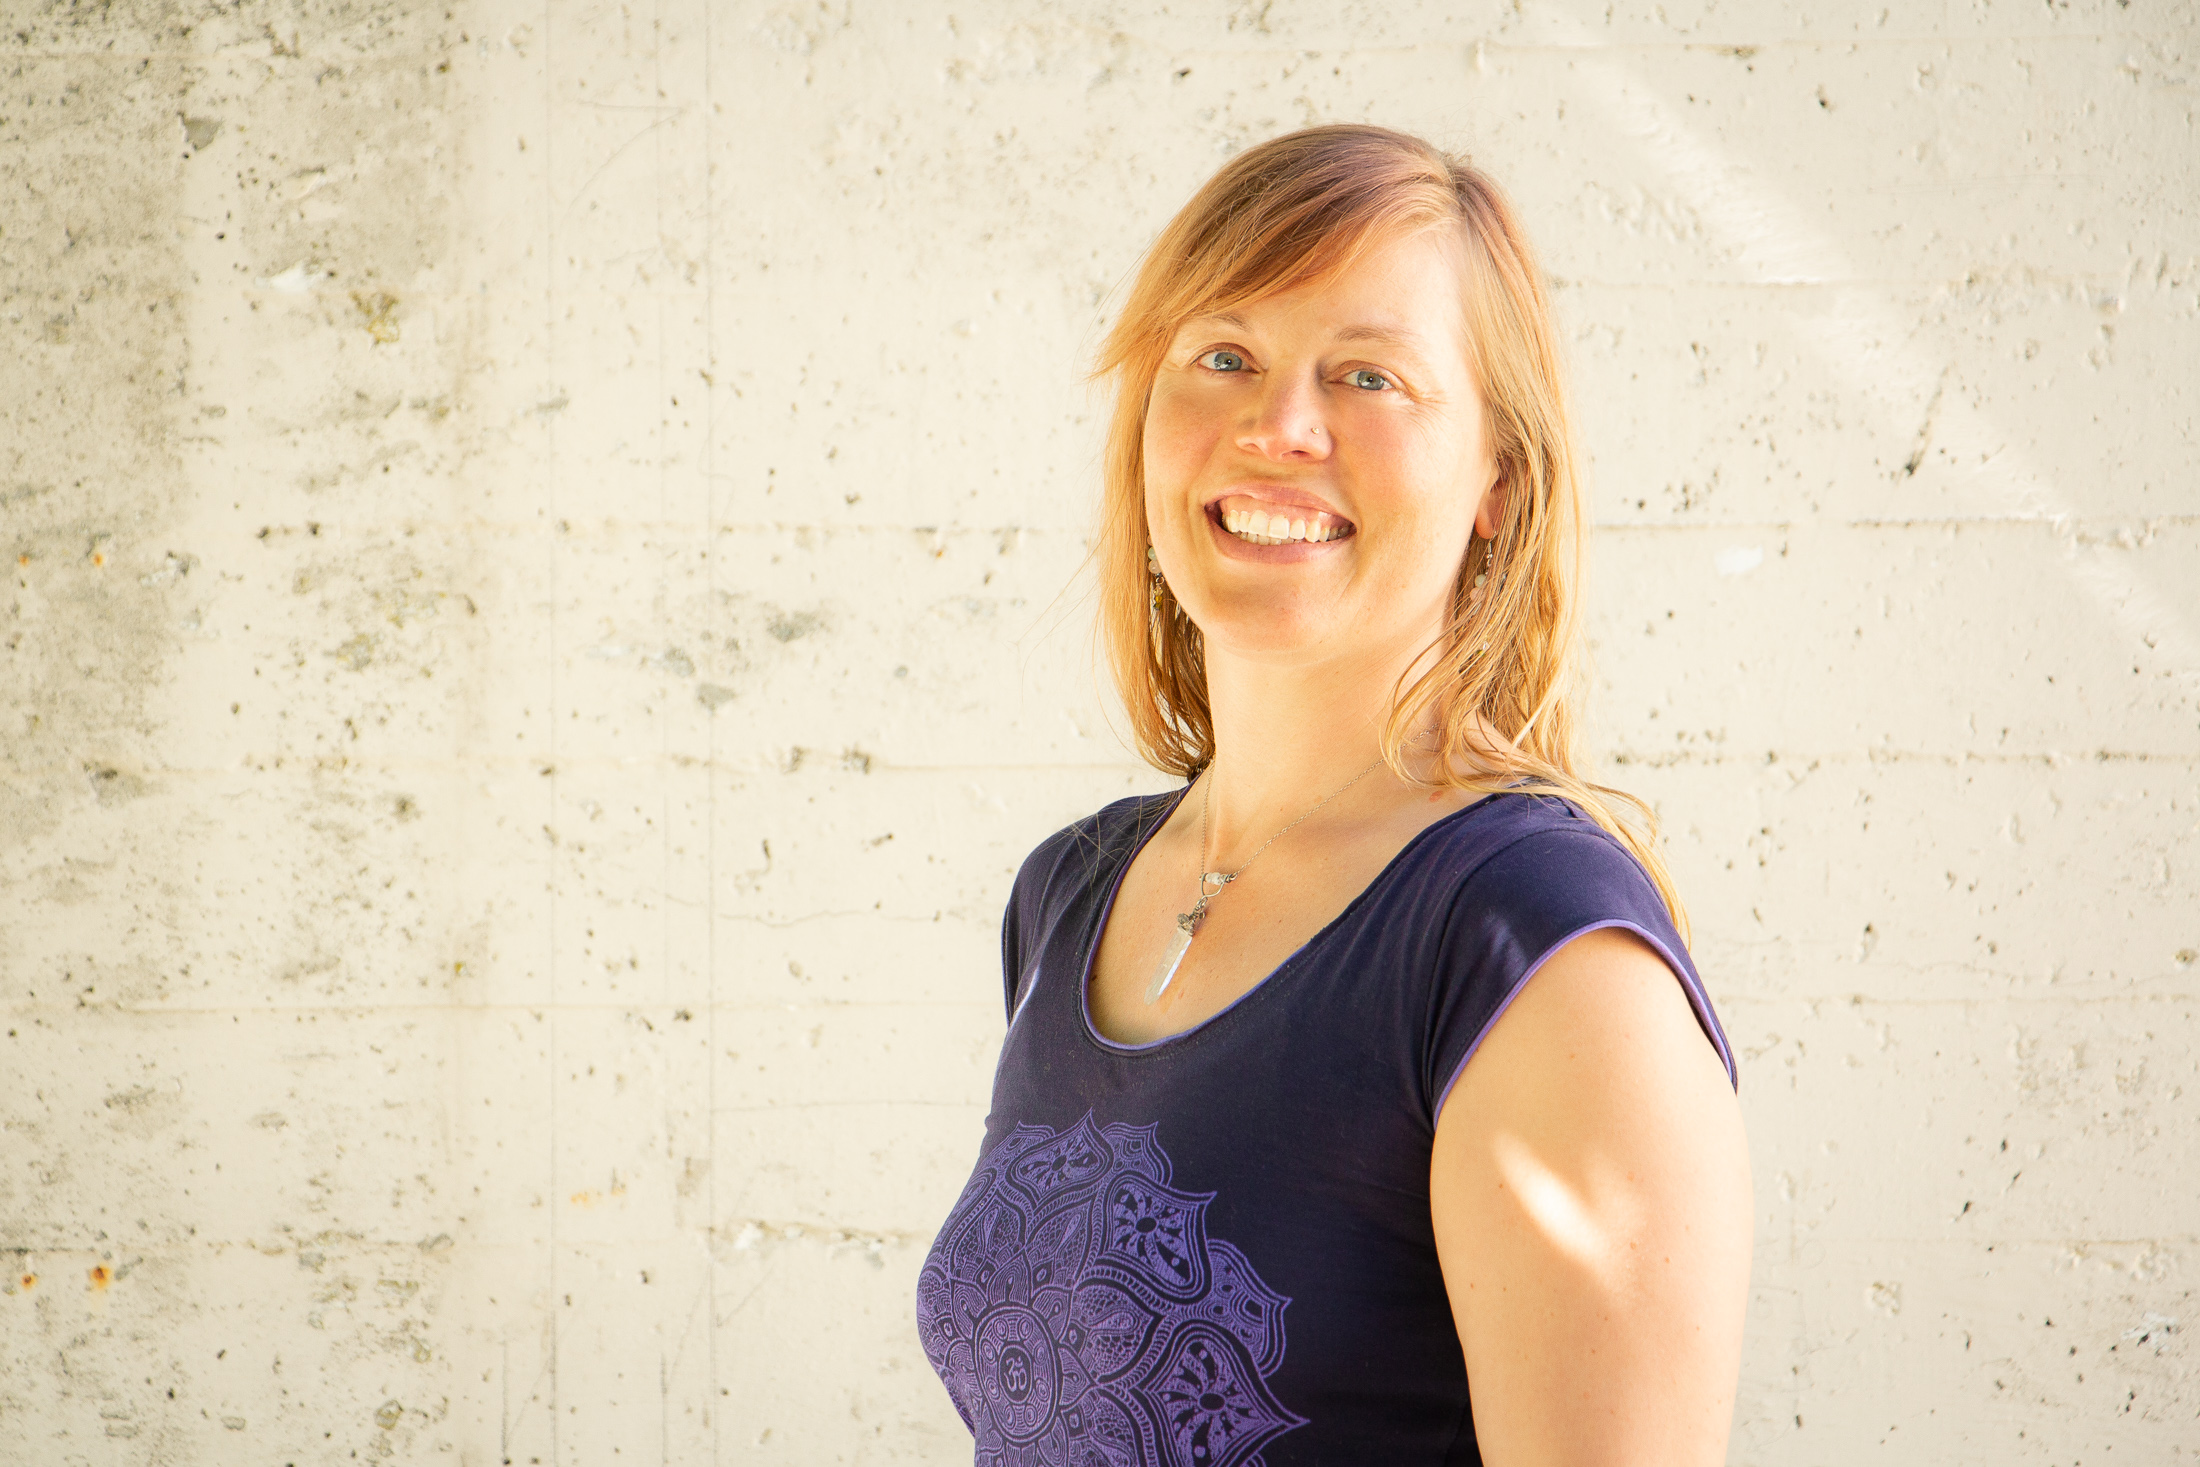 Jacquie Rae Potter - Sound Healer, Massage Therapist, Yoga Instructor